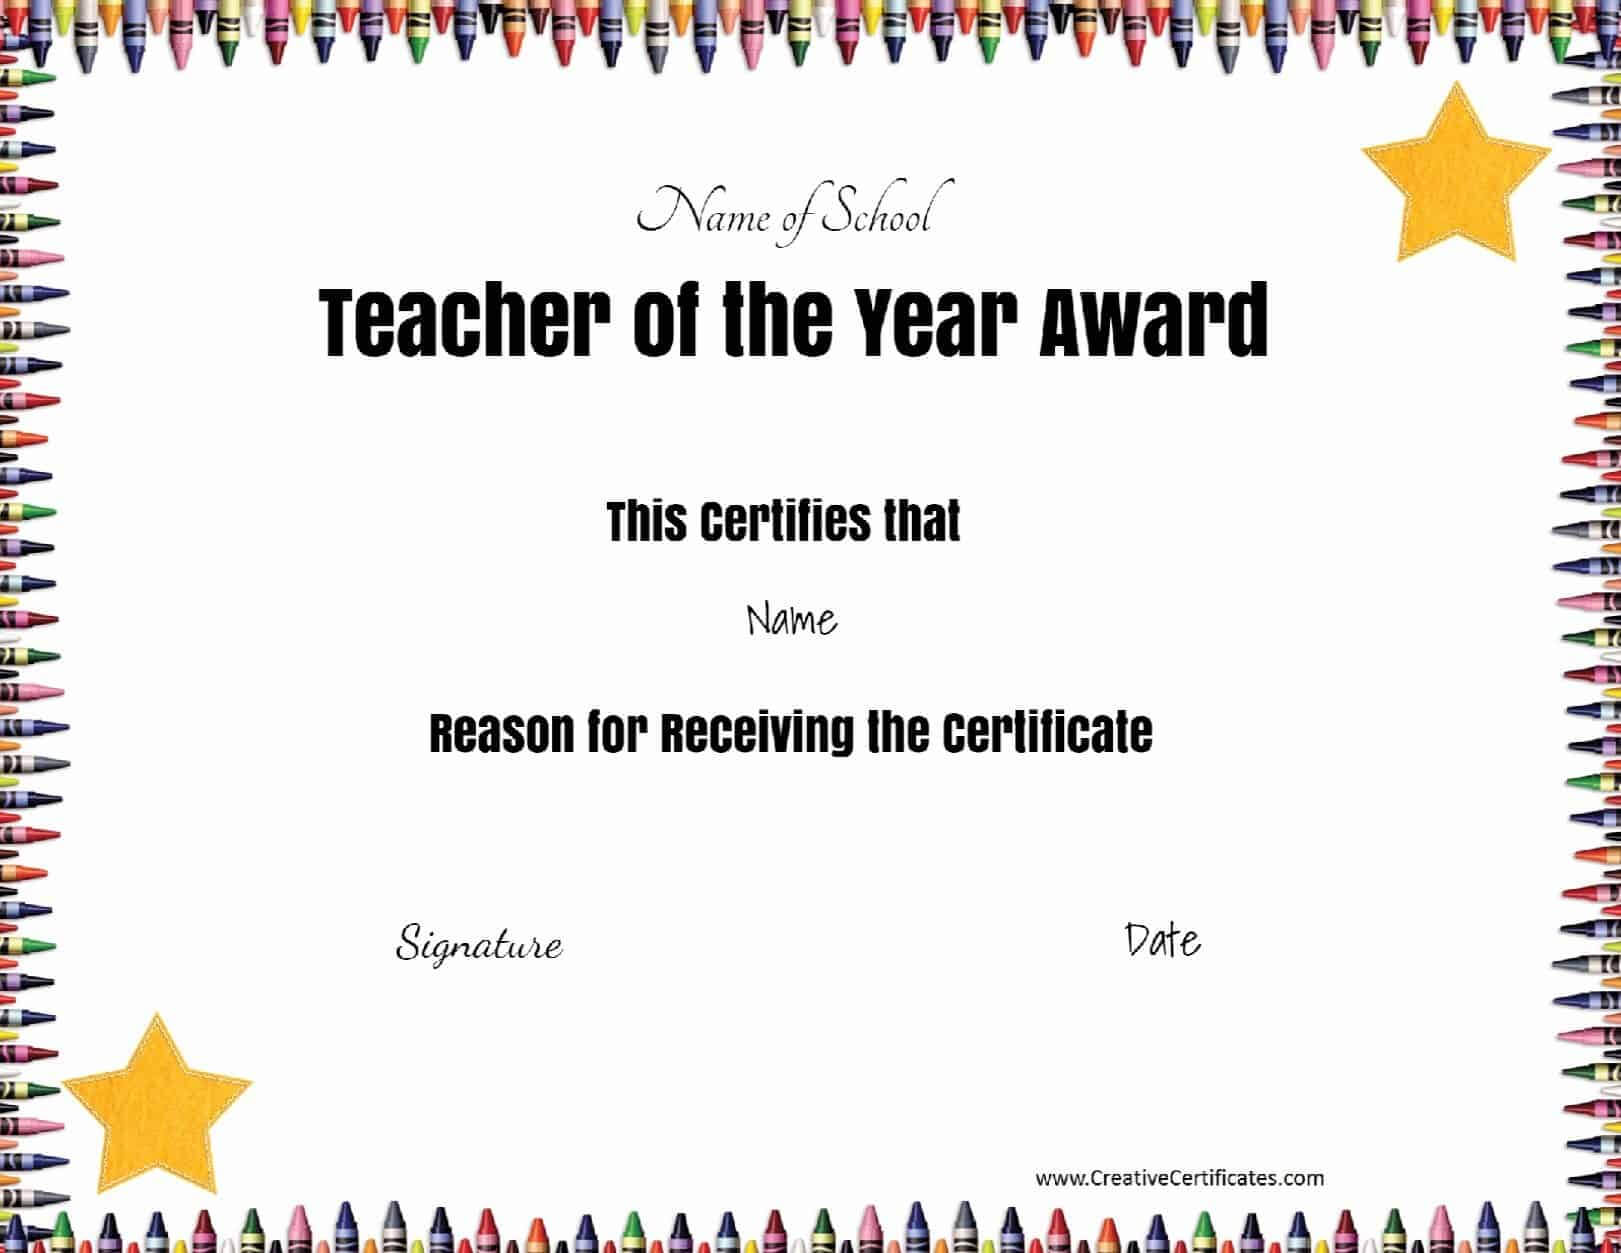 Free Certificate Of Appreciation For Teachers | Customize Online Throughout Best Teacher Certificate Templates Free